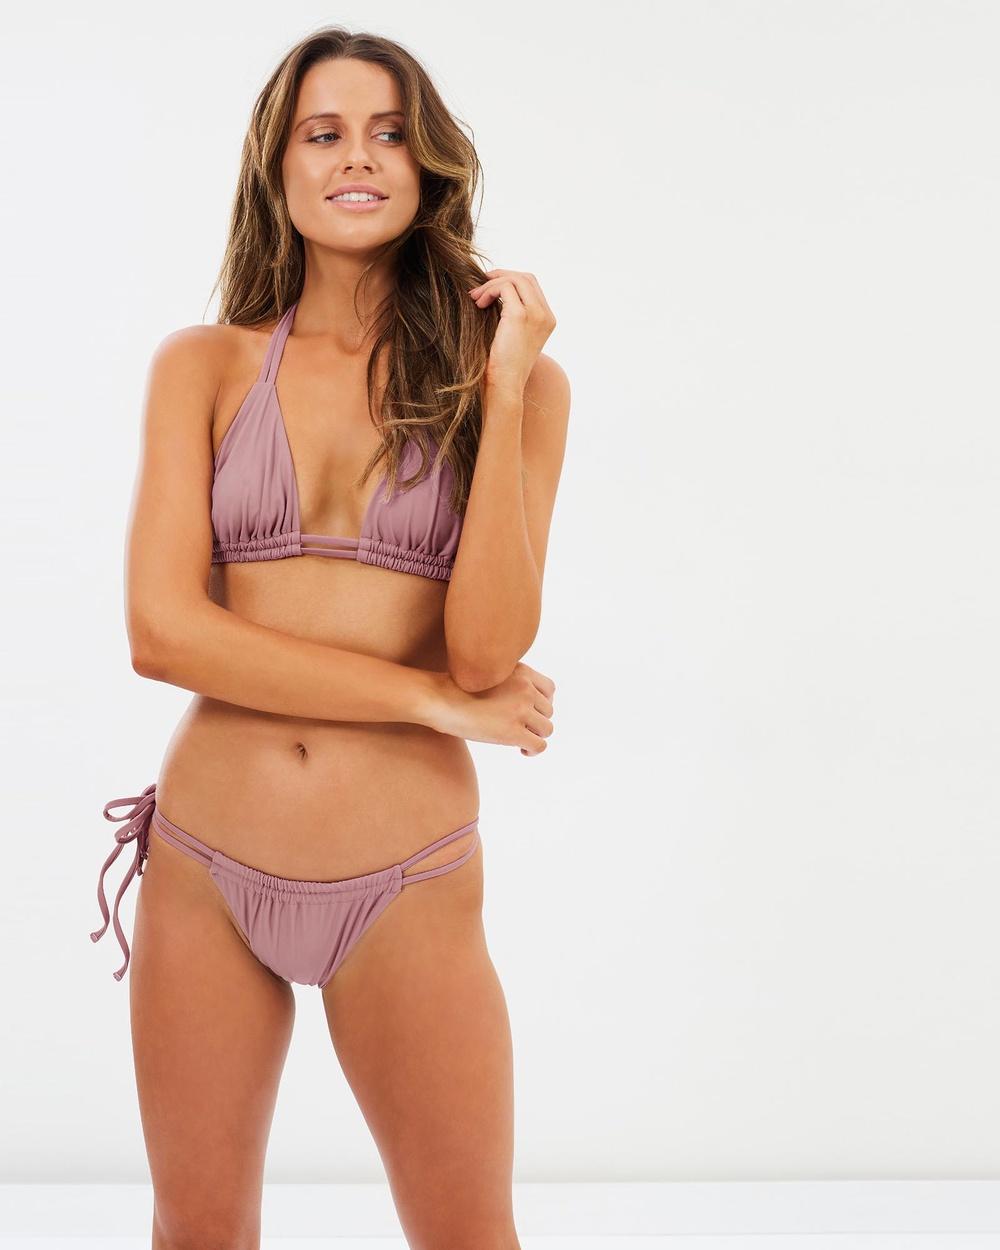 Tanliines The Radical Briefs Bikini Bottoms Lilac The Radical Briefs